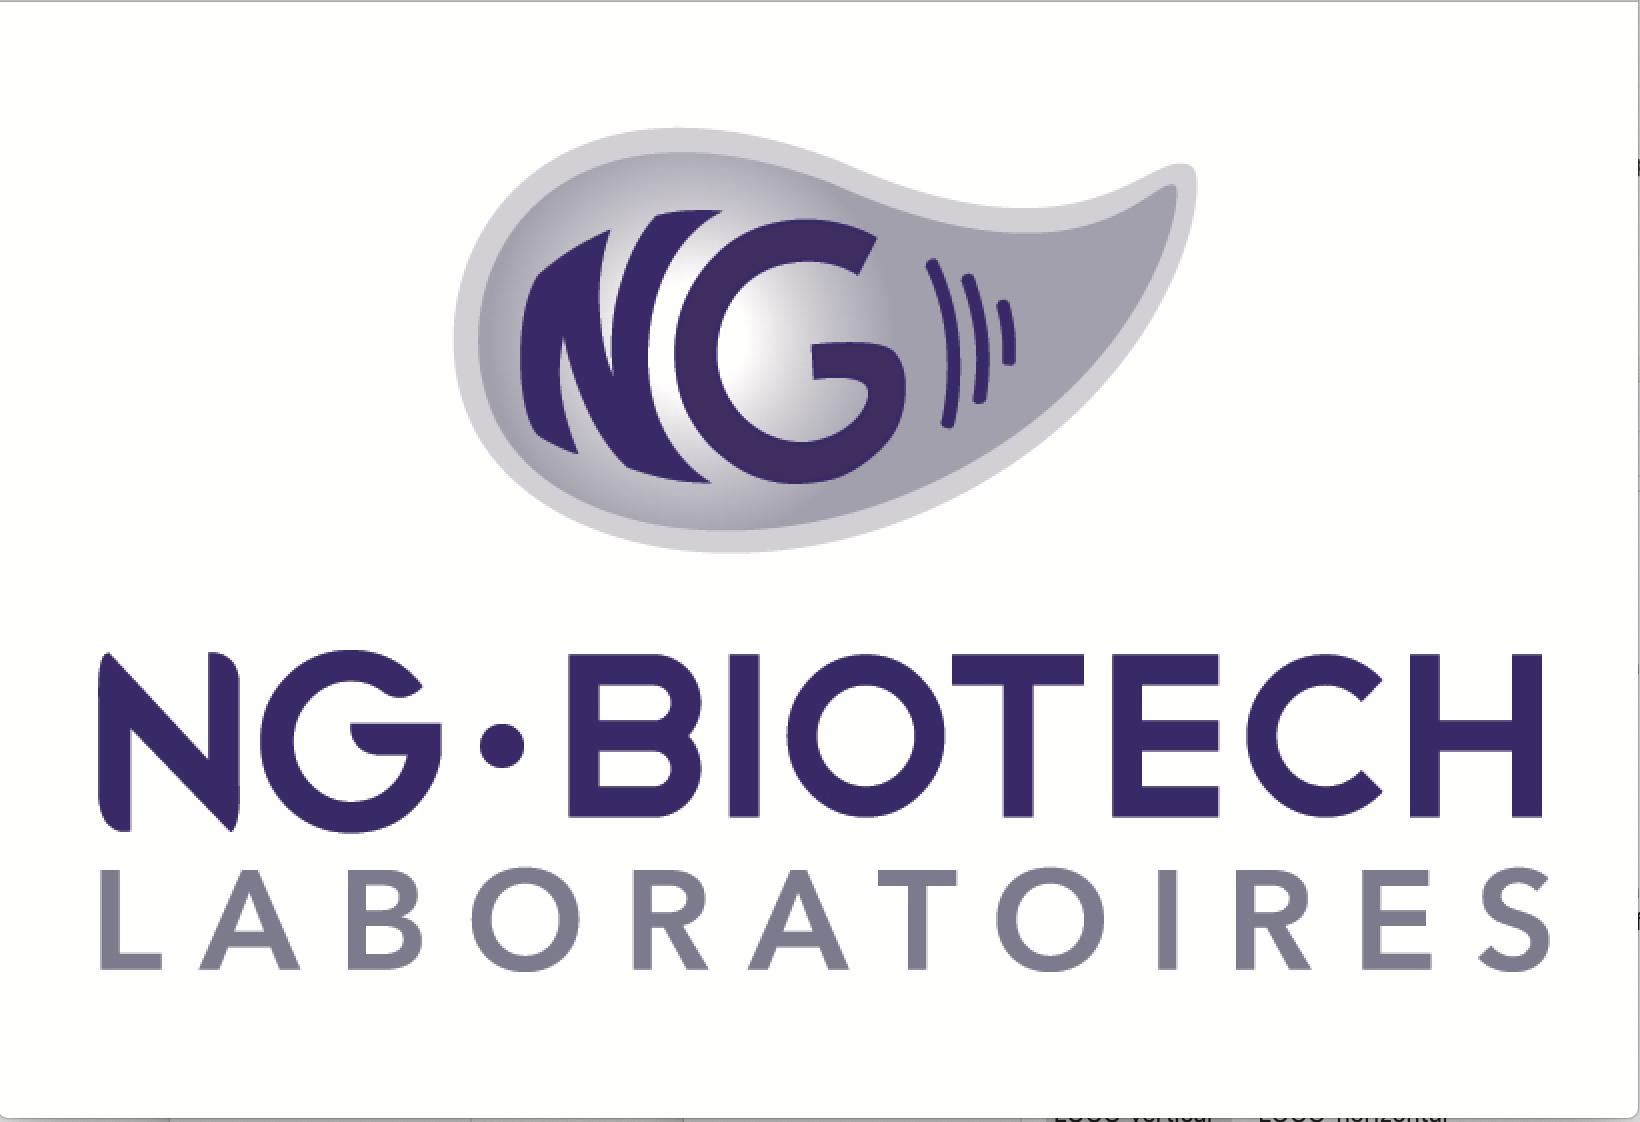 Logo - NG BIOTECH